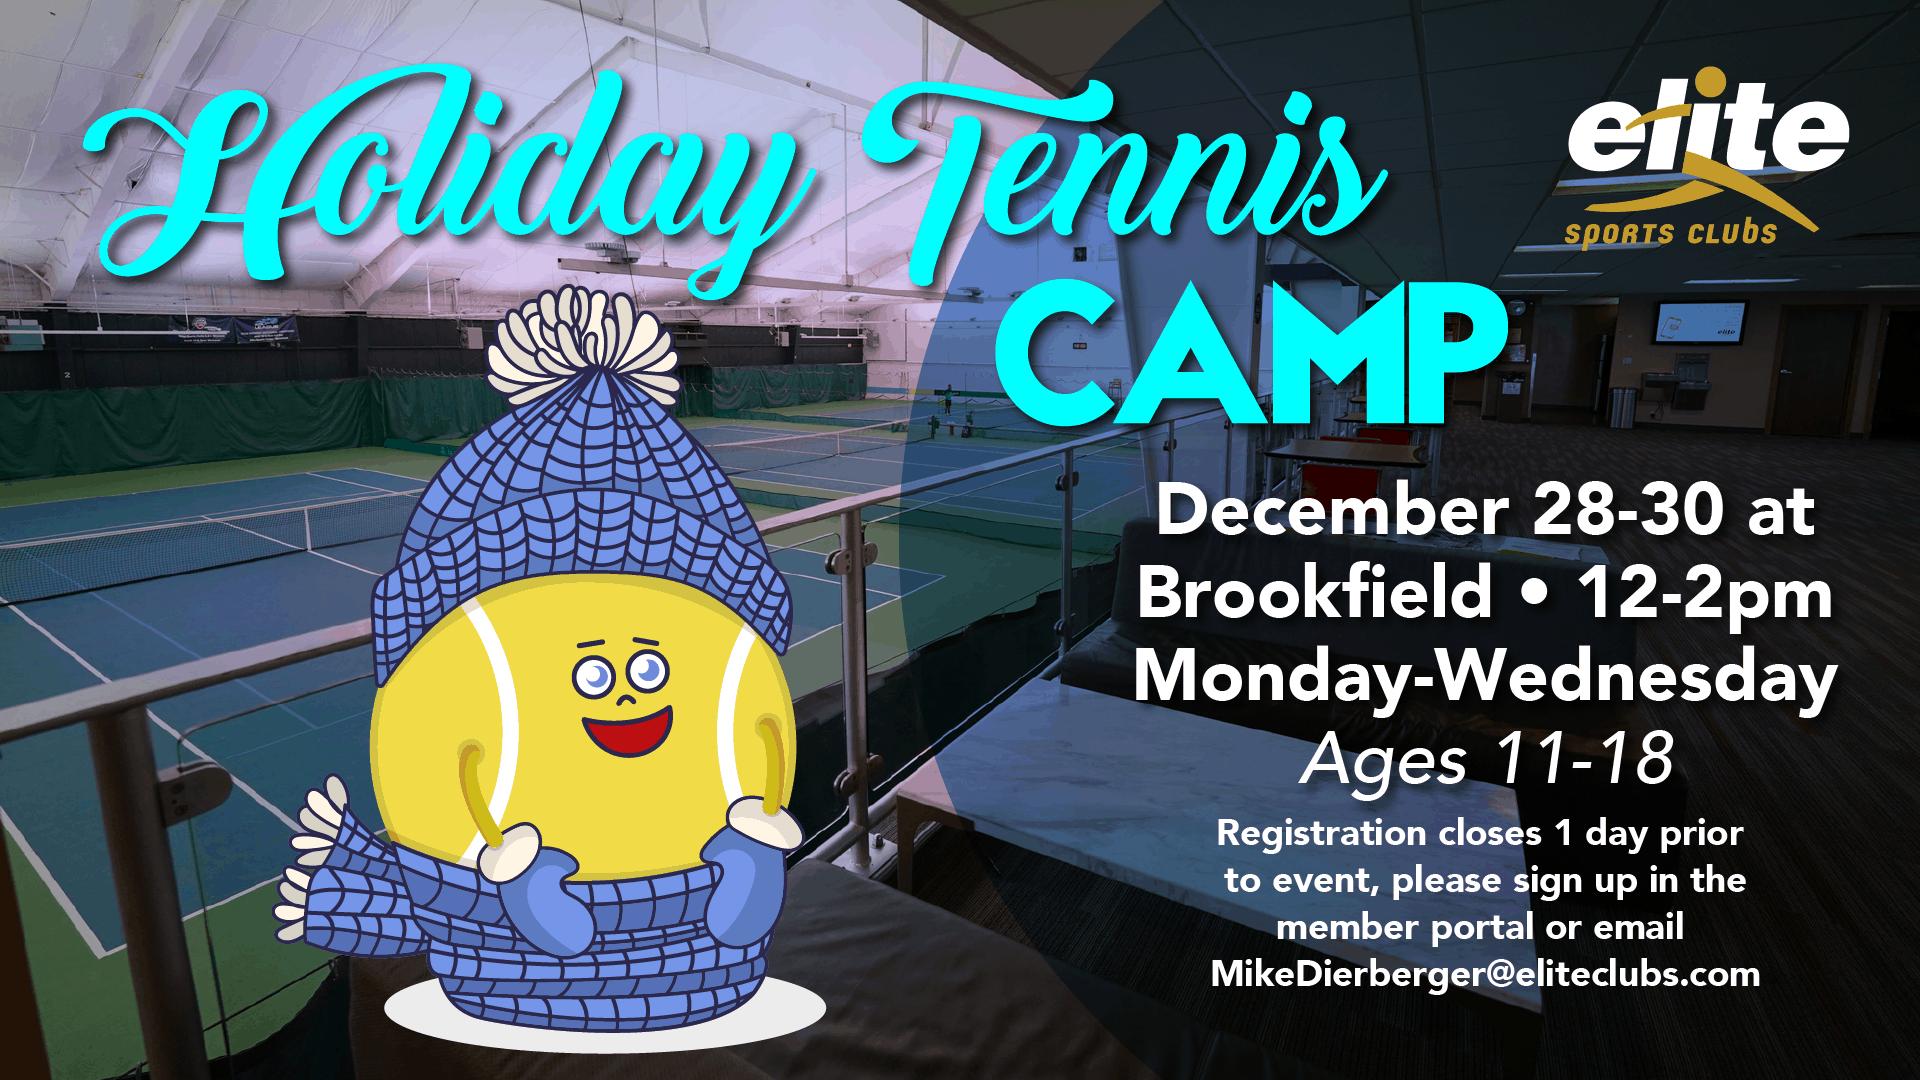 Holiday Tennis Camp - Elite Brookfield - December 2020